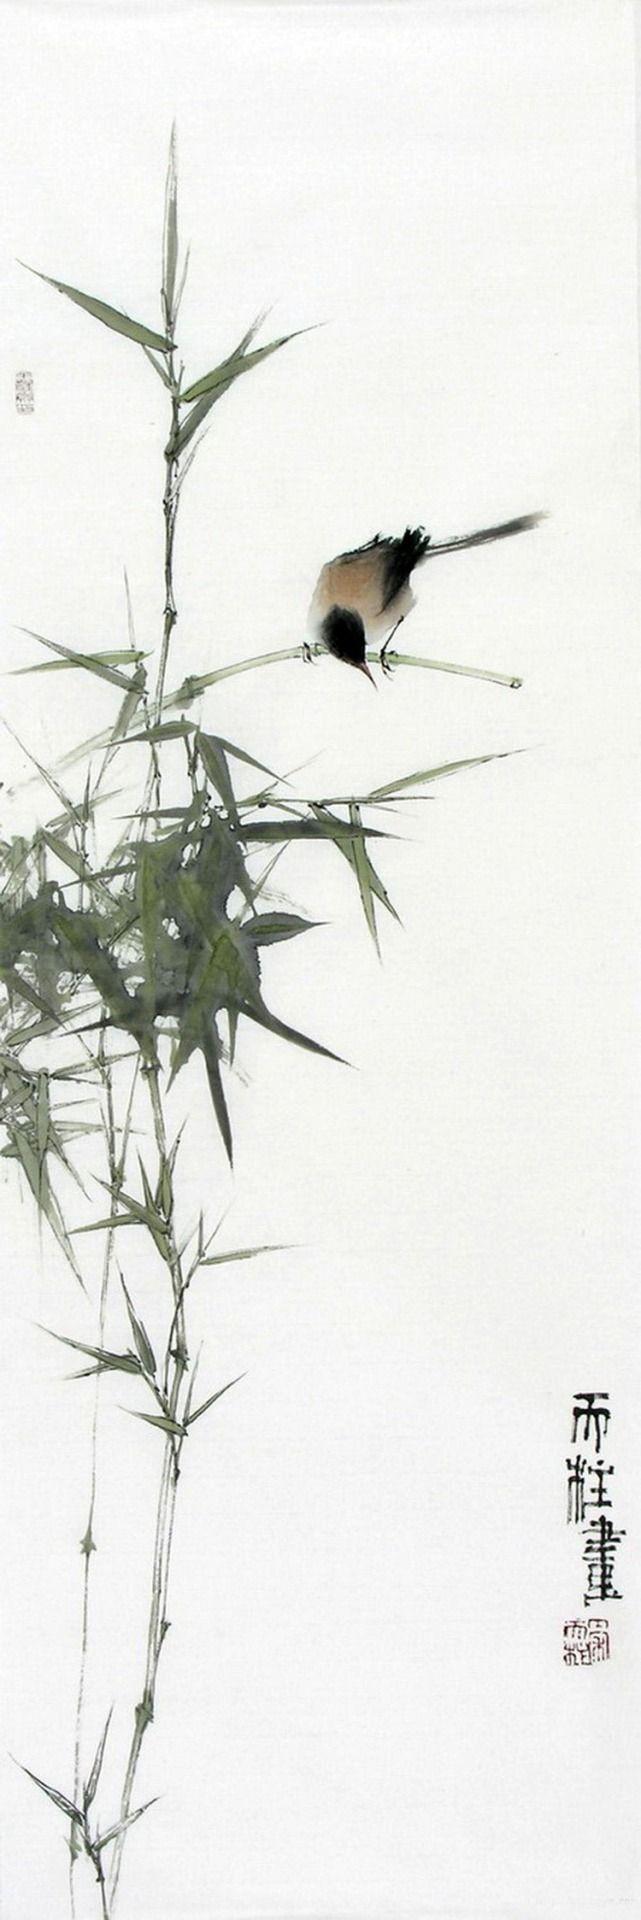 Dreaming >> Artemis Dreaming : Photo | Paintings | Pinterest | Artemis, Watercolor and Paintings